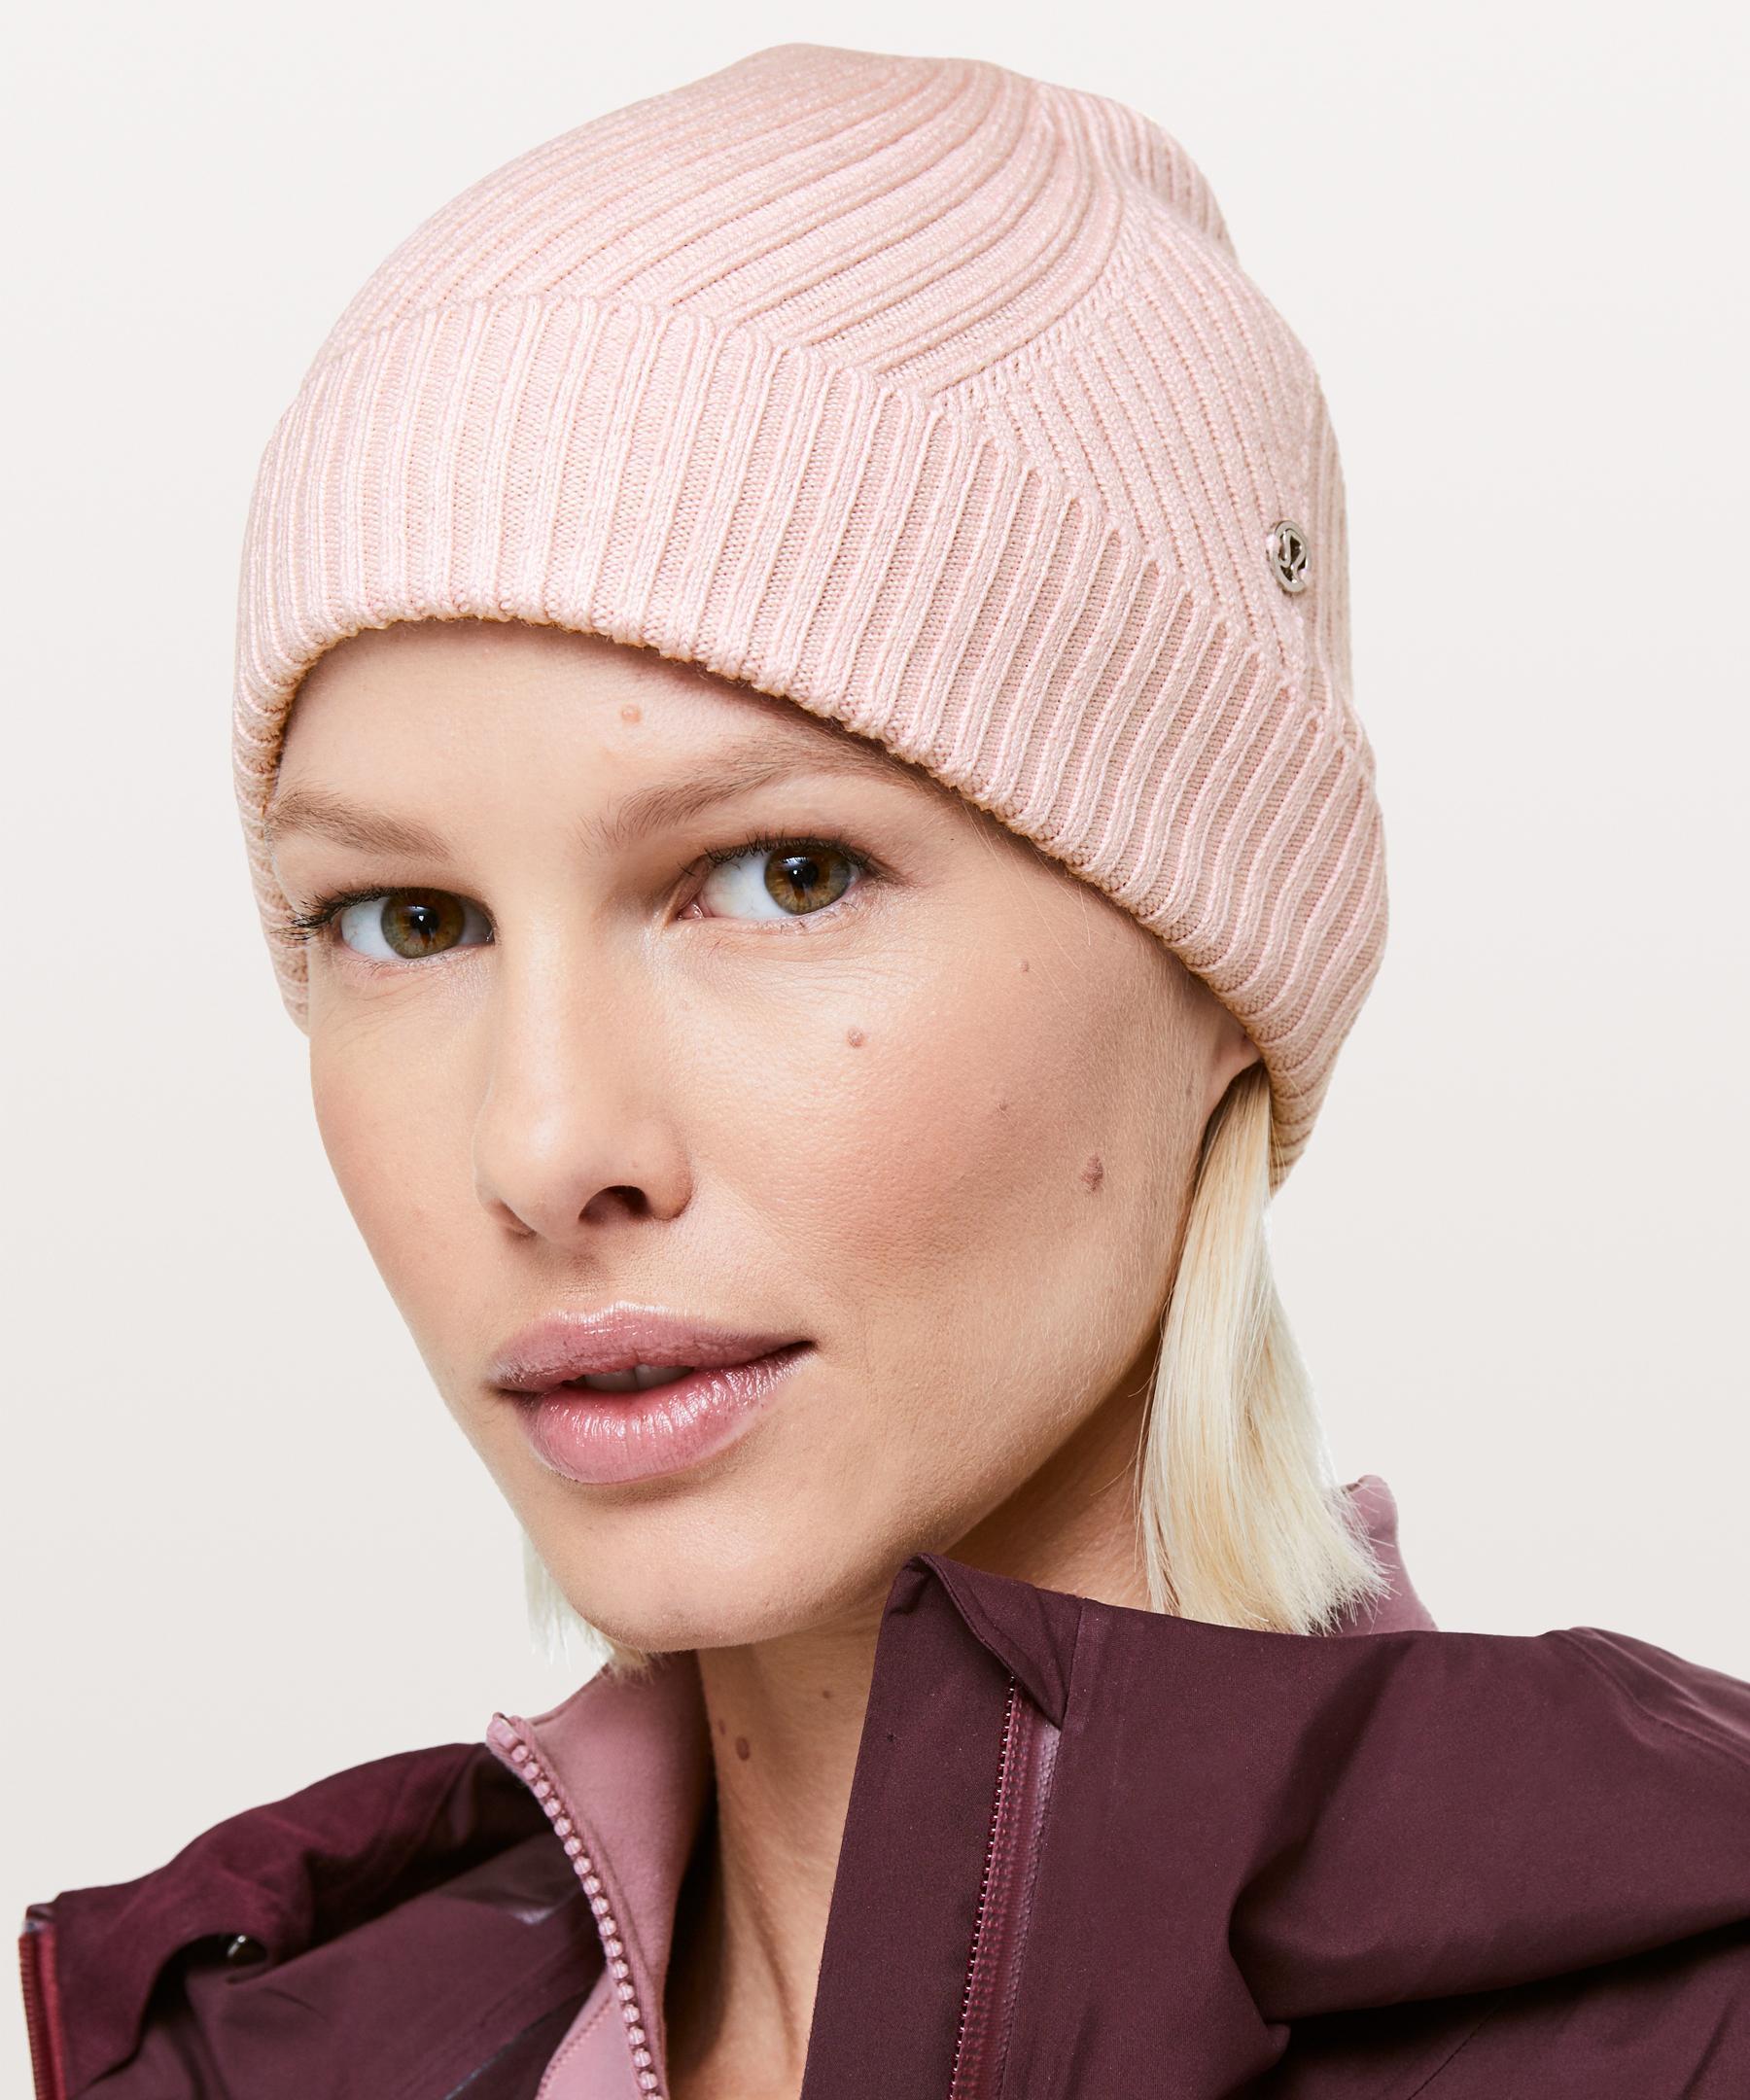 55d73ed8e lululemon athletica Twist Of Cozy Knit Beanie in Pink - Lyst